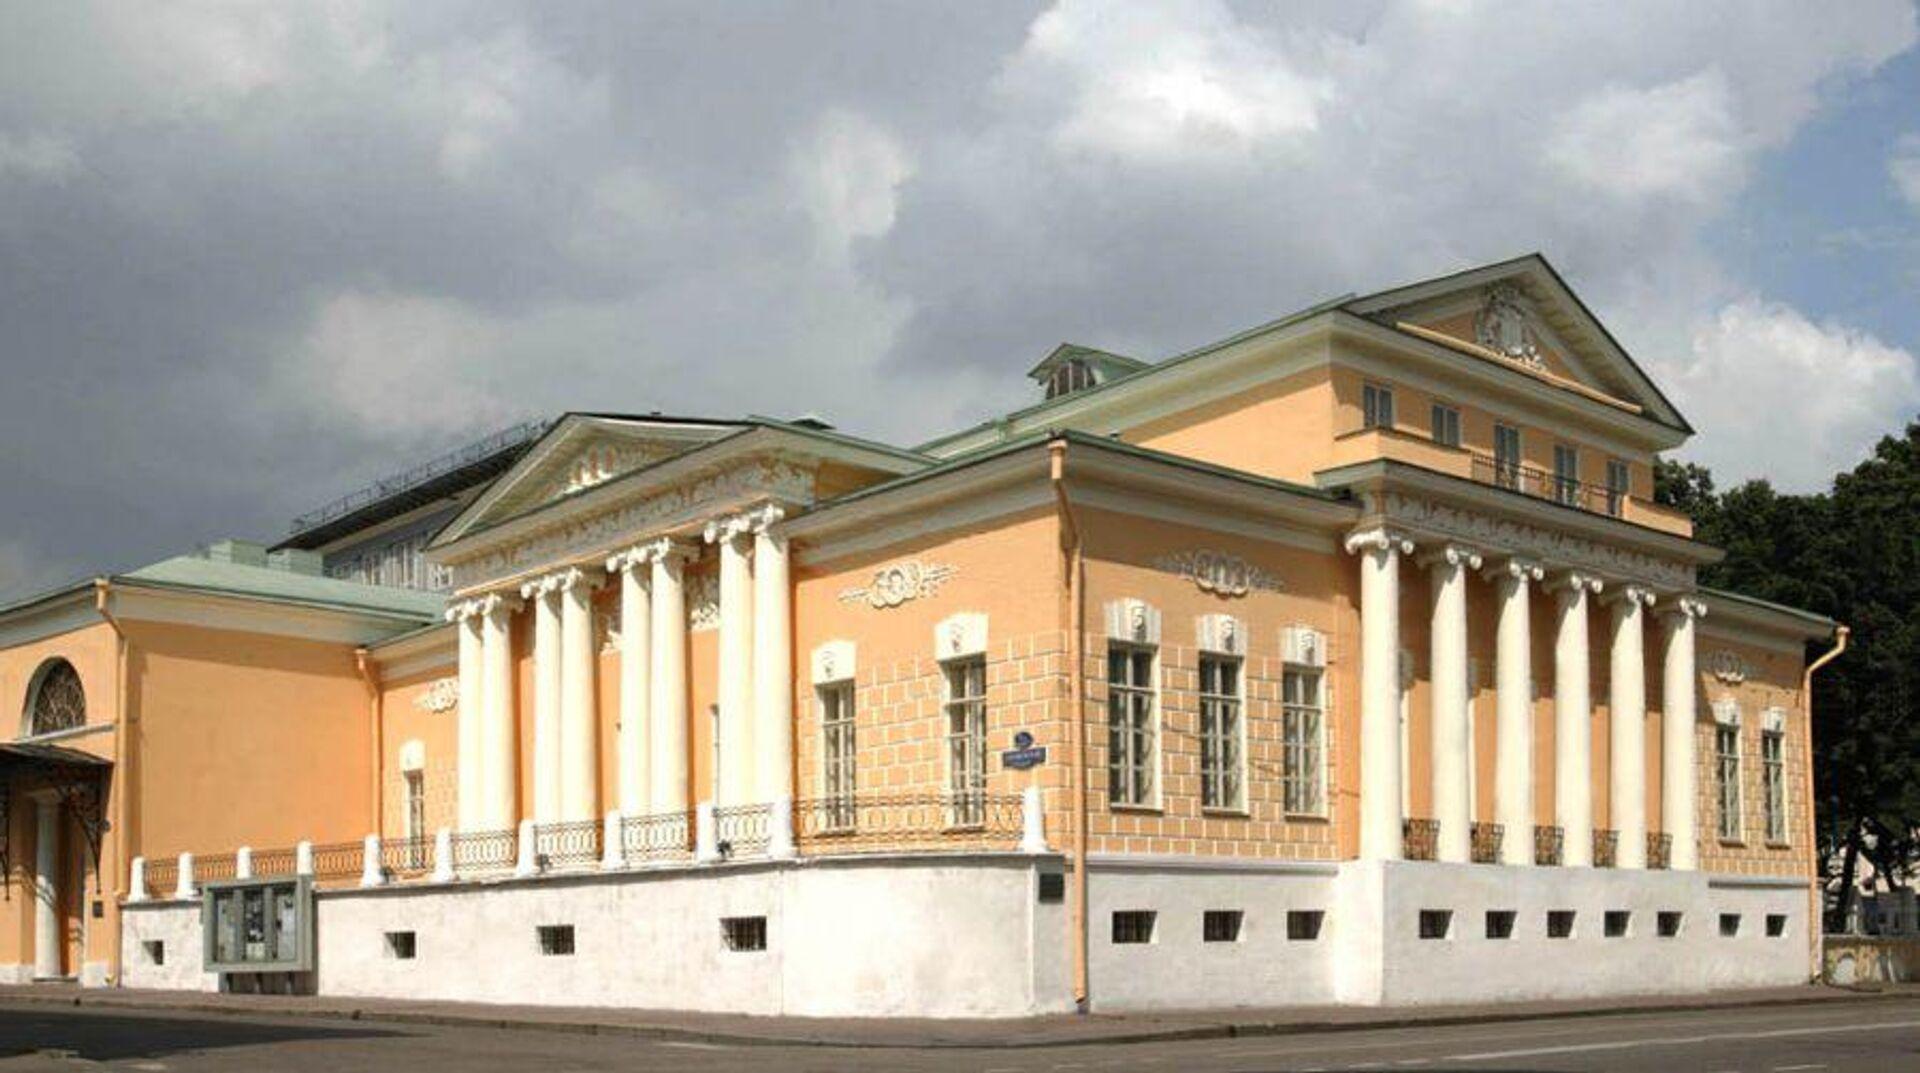 Государственный музей А.С. Пушкина - РИА Новости, 1920, 06.01.2021